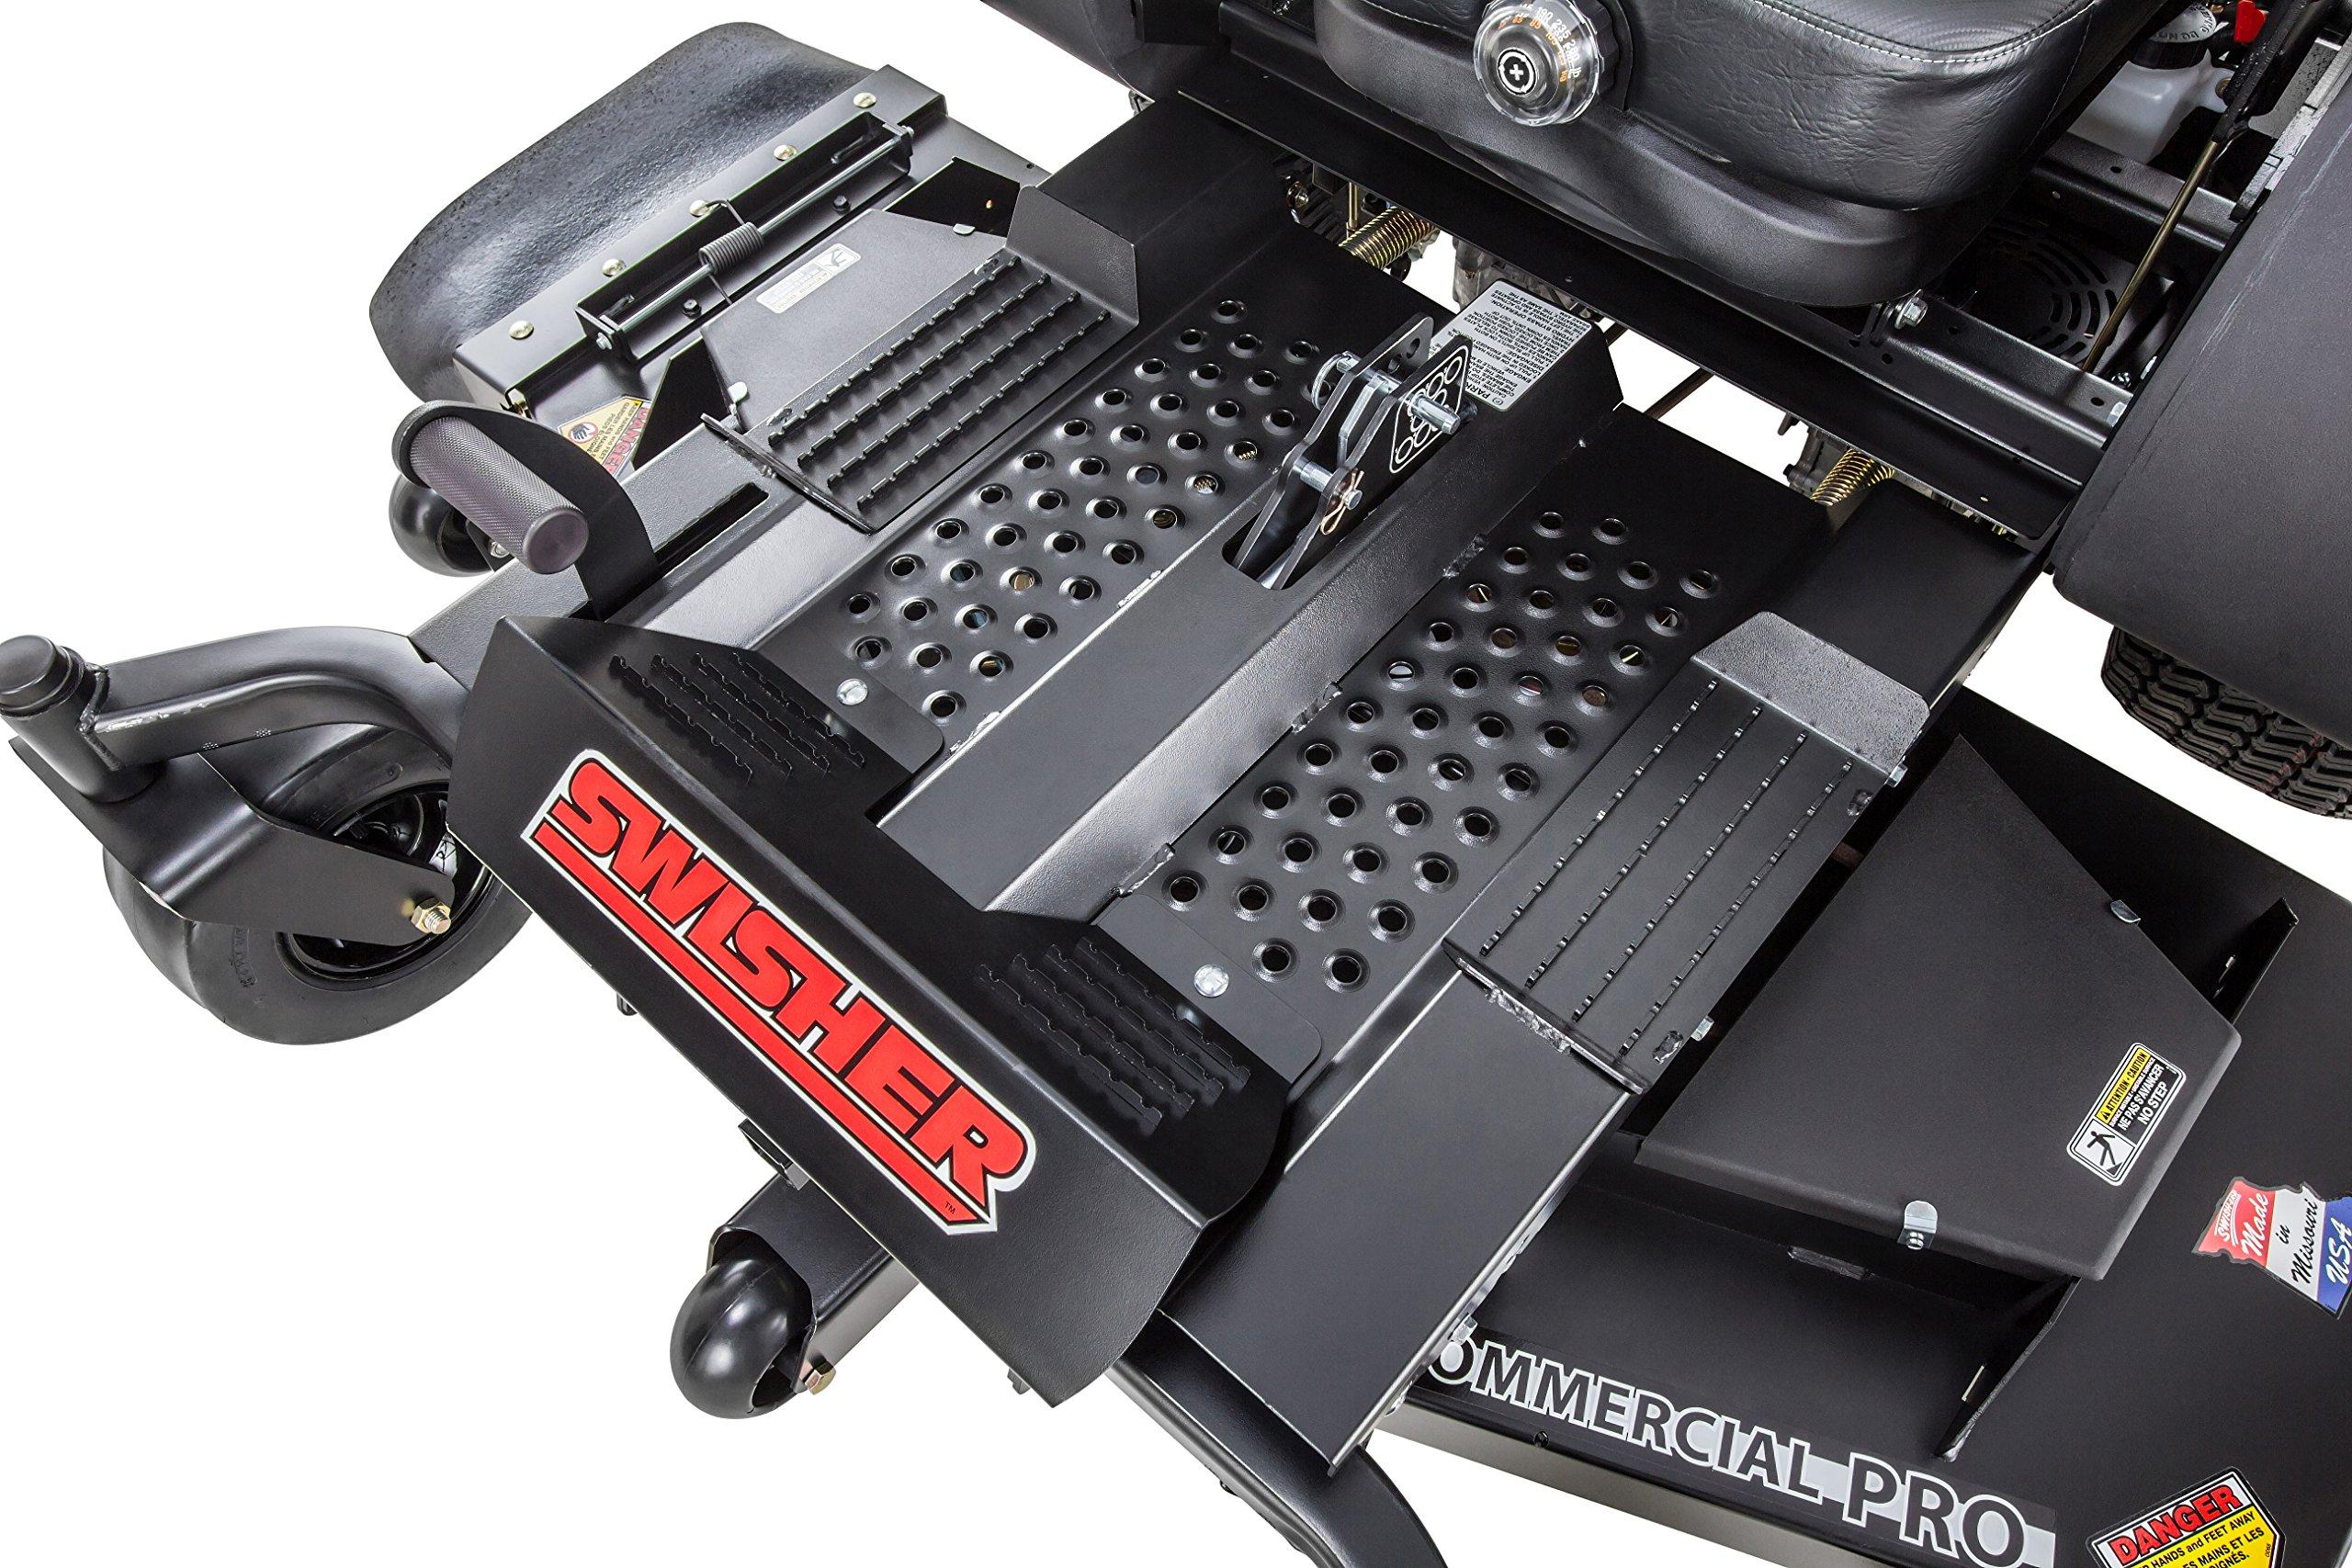 Swisher Z21554CPHO 21.5HP Reponse Gen 2 Honda Ztr Commercial Pro, Black, 54'' by Swisher (Image #13)